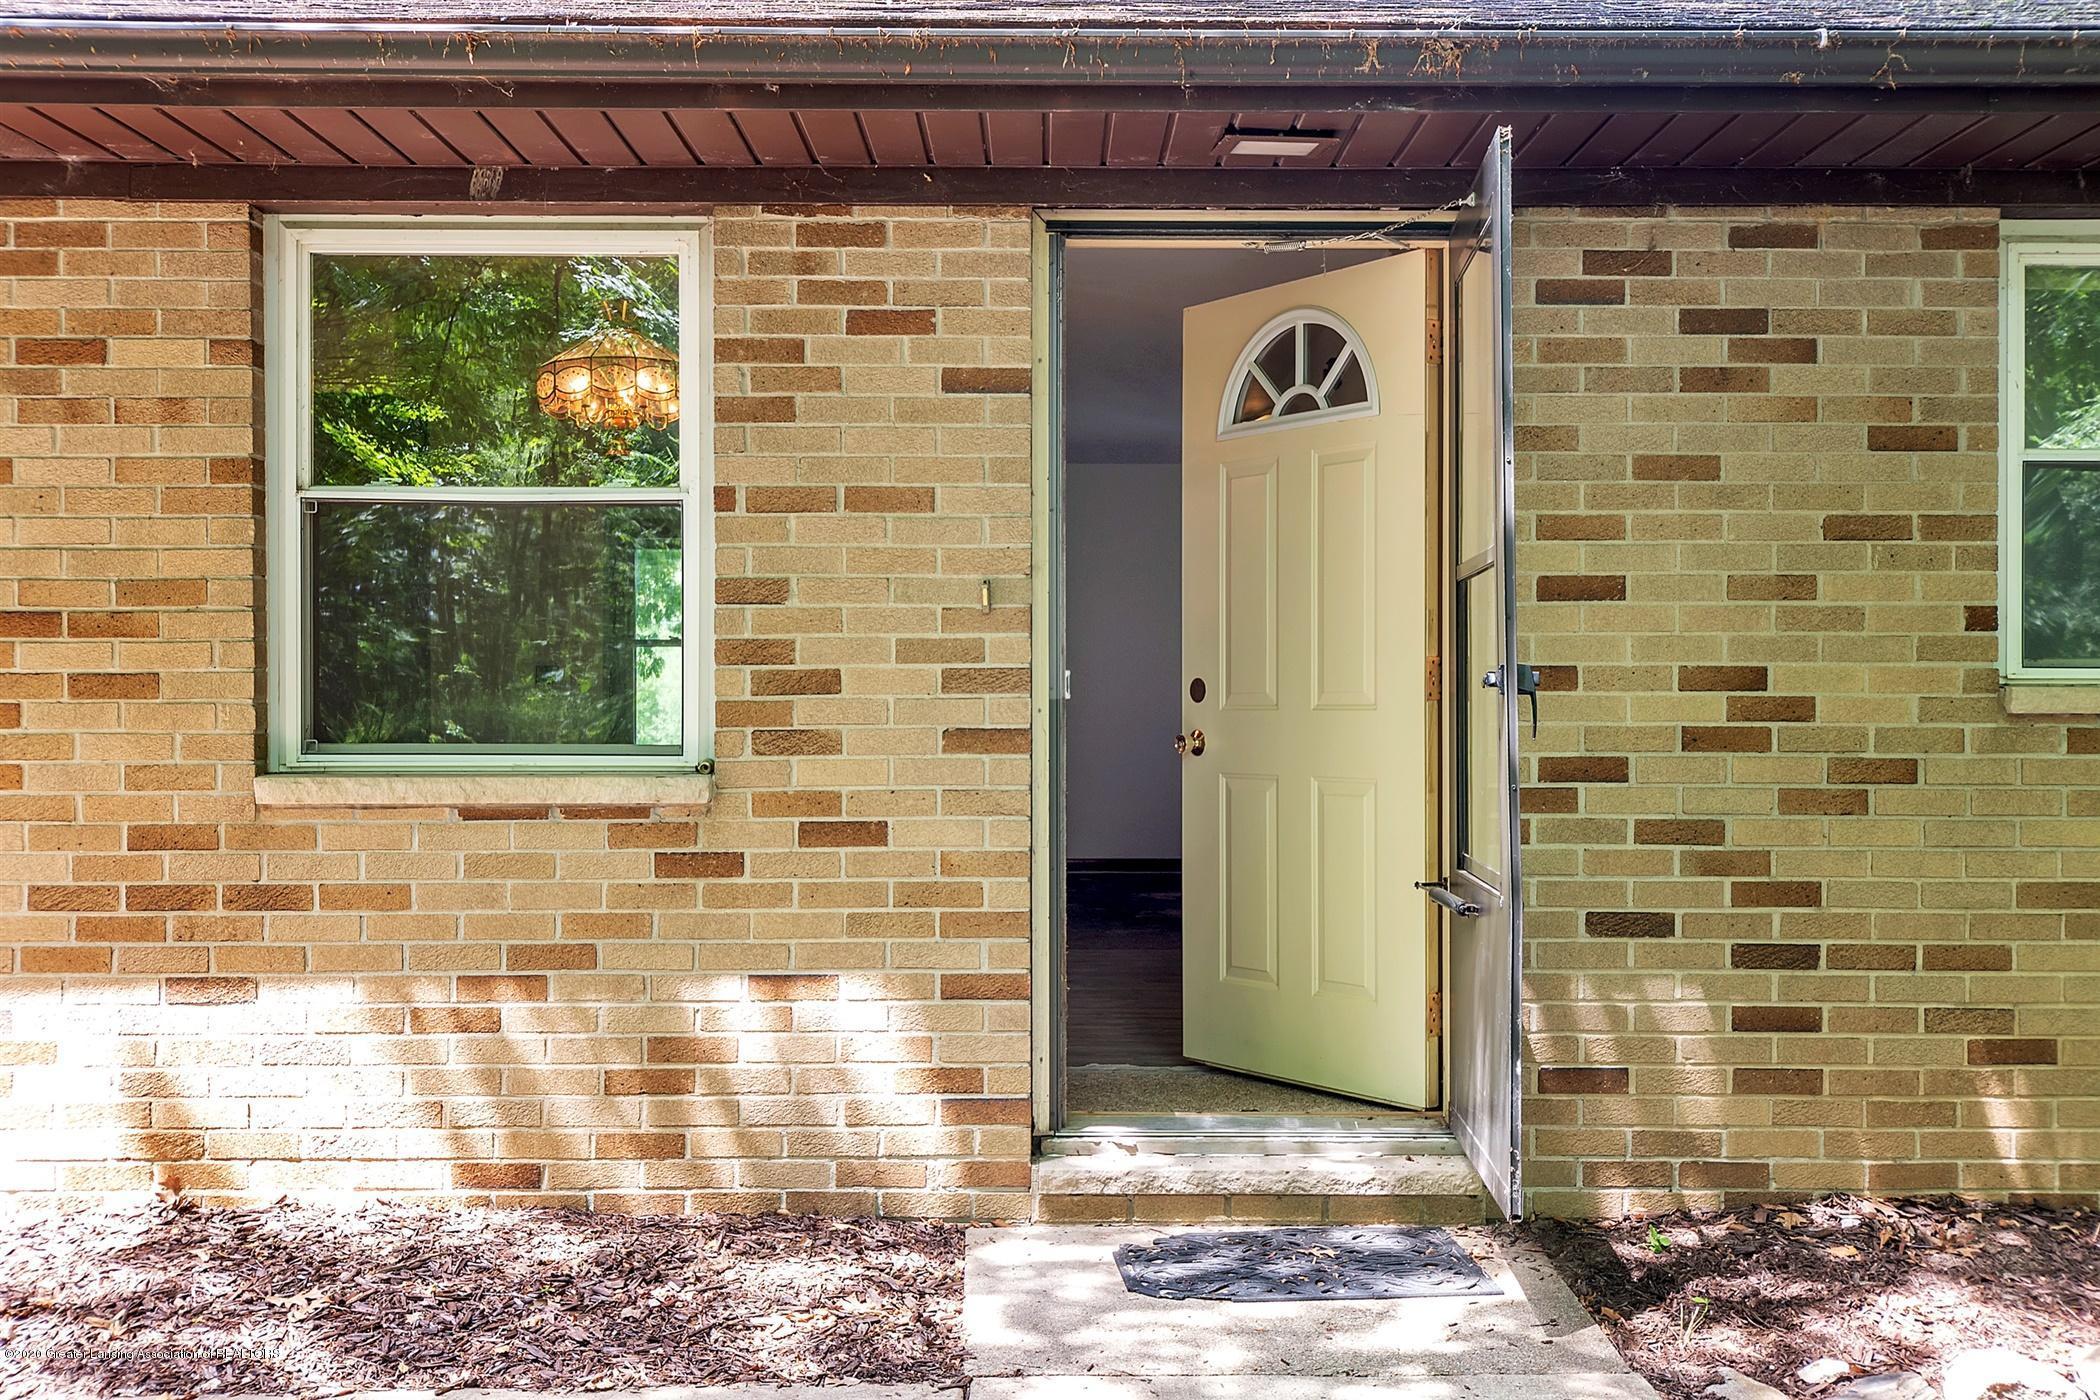 3269 S Waverly Rd - 05-3269 S Waverly Rd-windowstill-re - 6